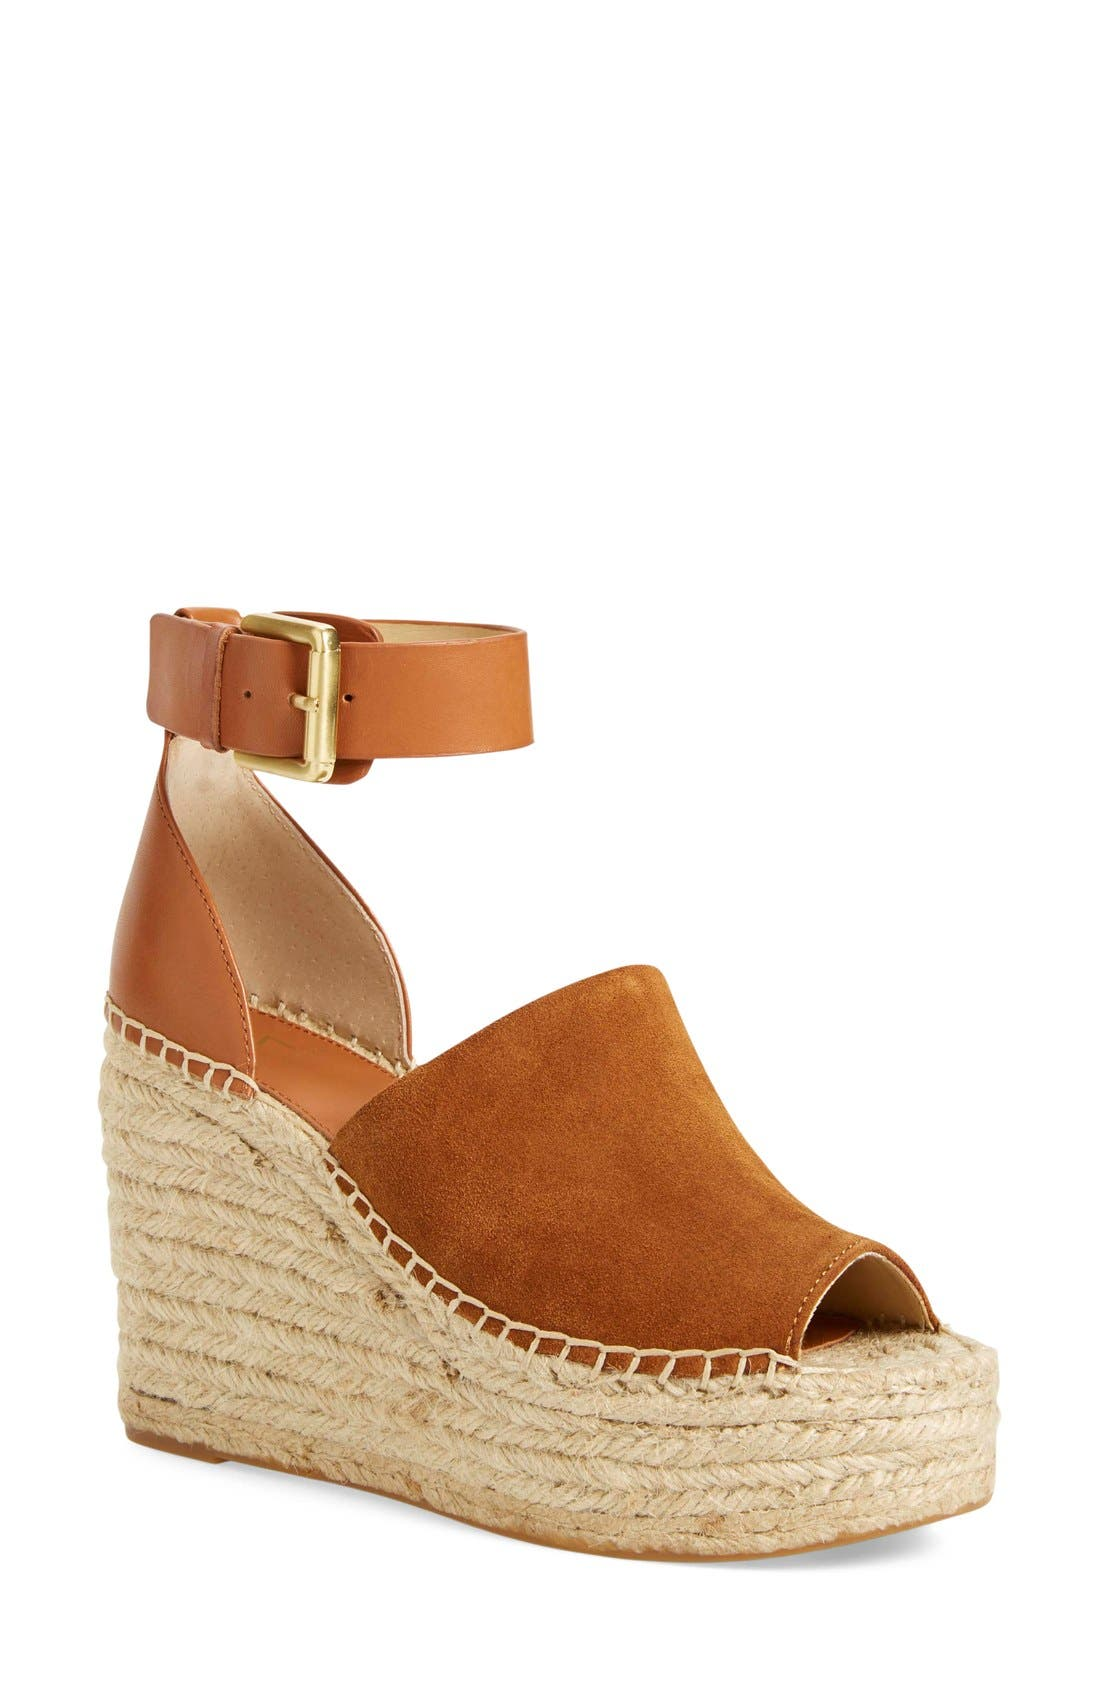 Adalyn Espadrille Wedge Sandal, Main, color, TAN/ SADDLE